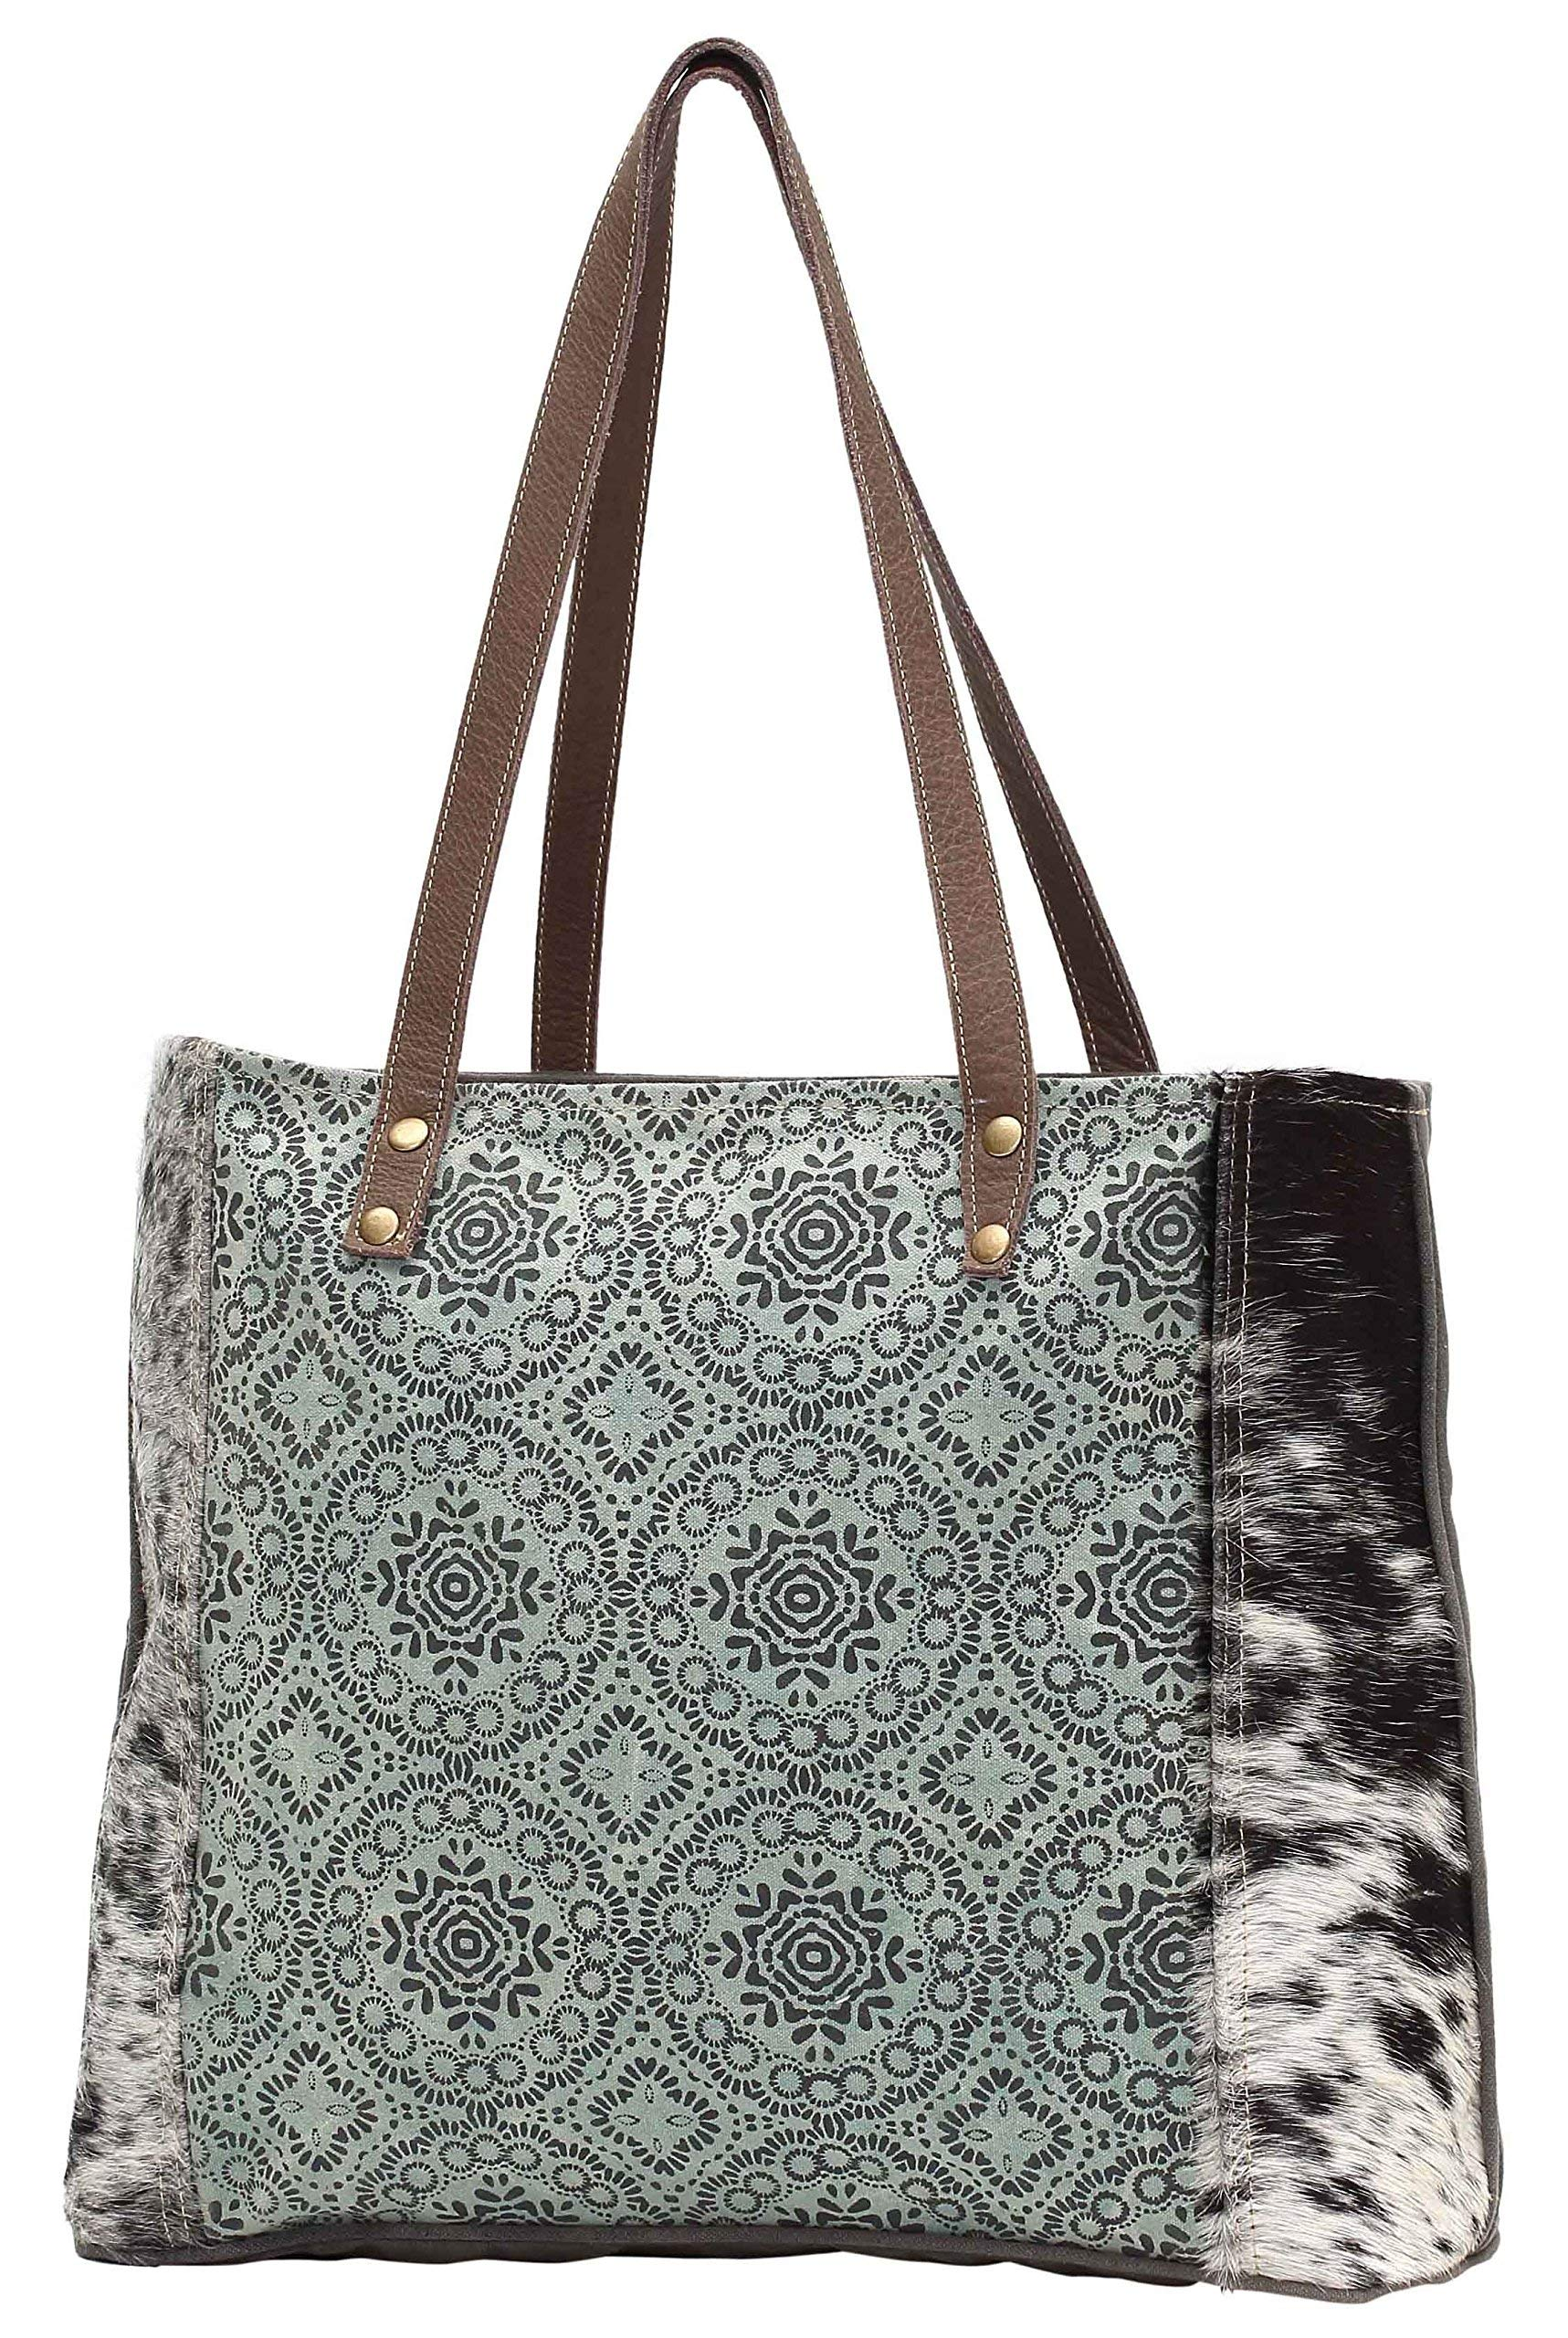 Myra Bag Green Floral Upcycled Canvas Weekender Bag S-1192